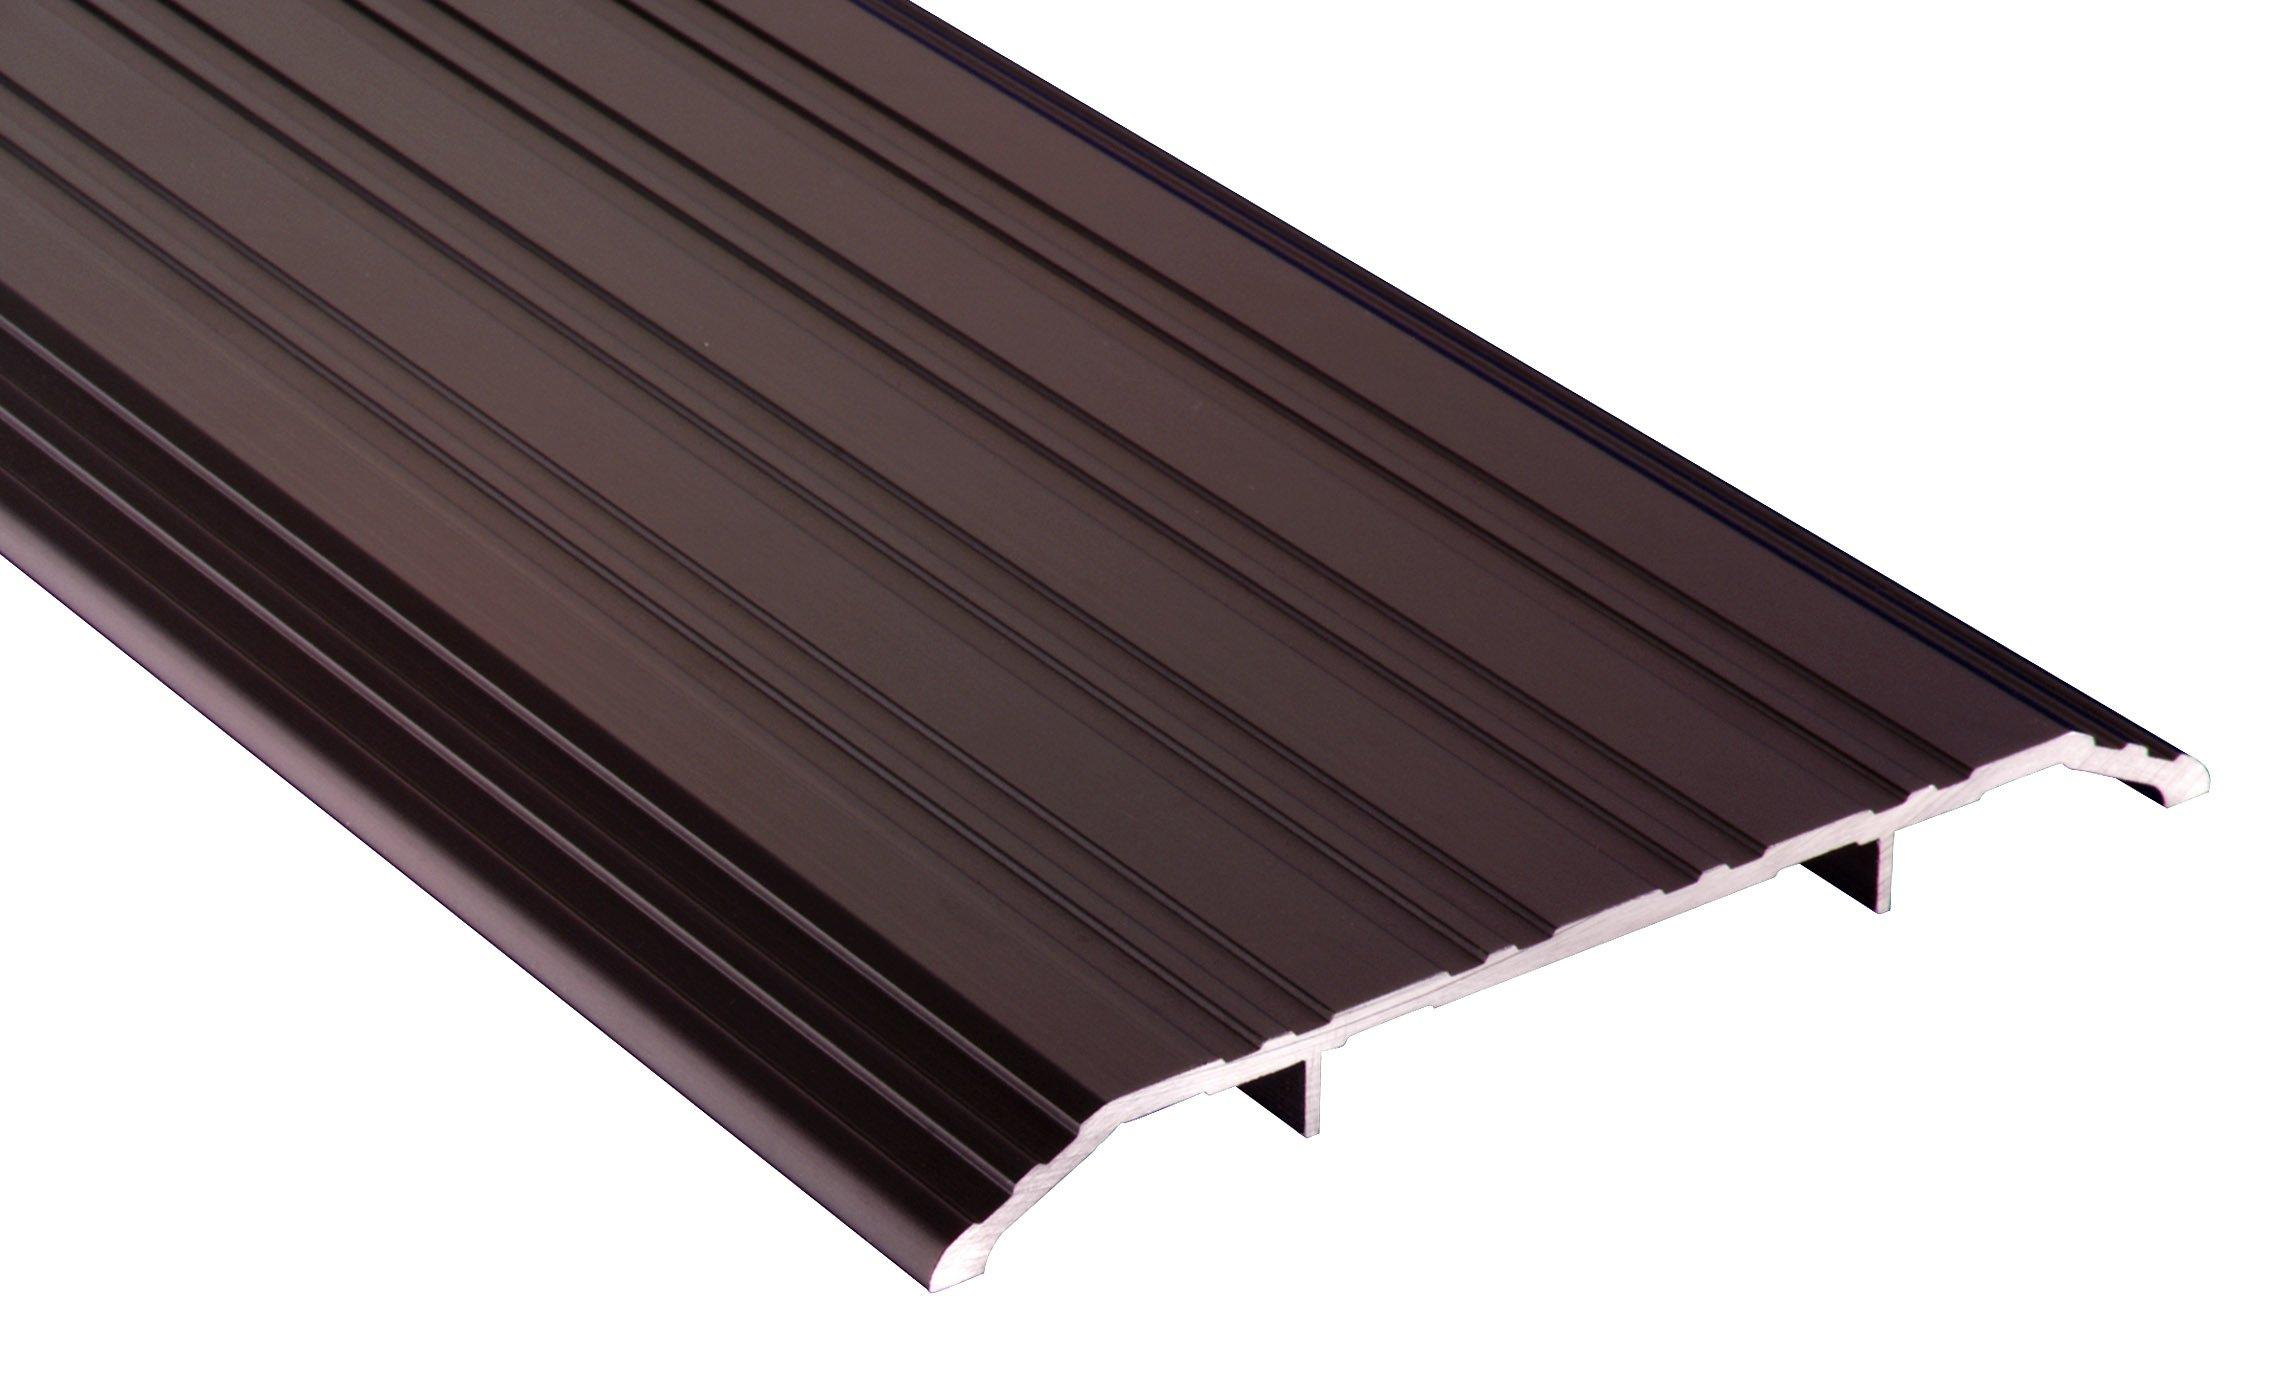 Pemko 085569 172D36 Saddle Threshold, Dark Bronze Anodized Aluminum, 5'' Width, 36'' Length, Aluminum by Pemko